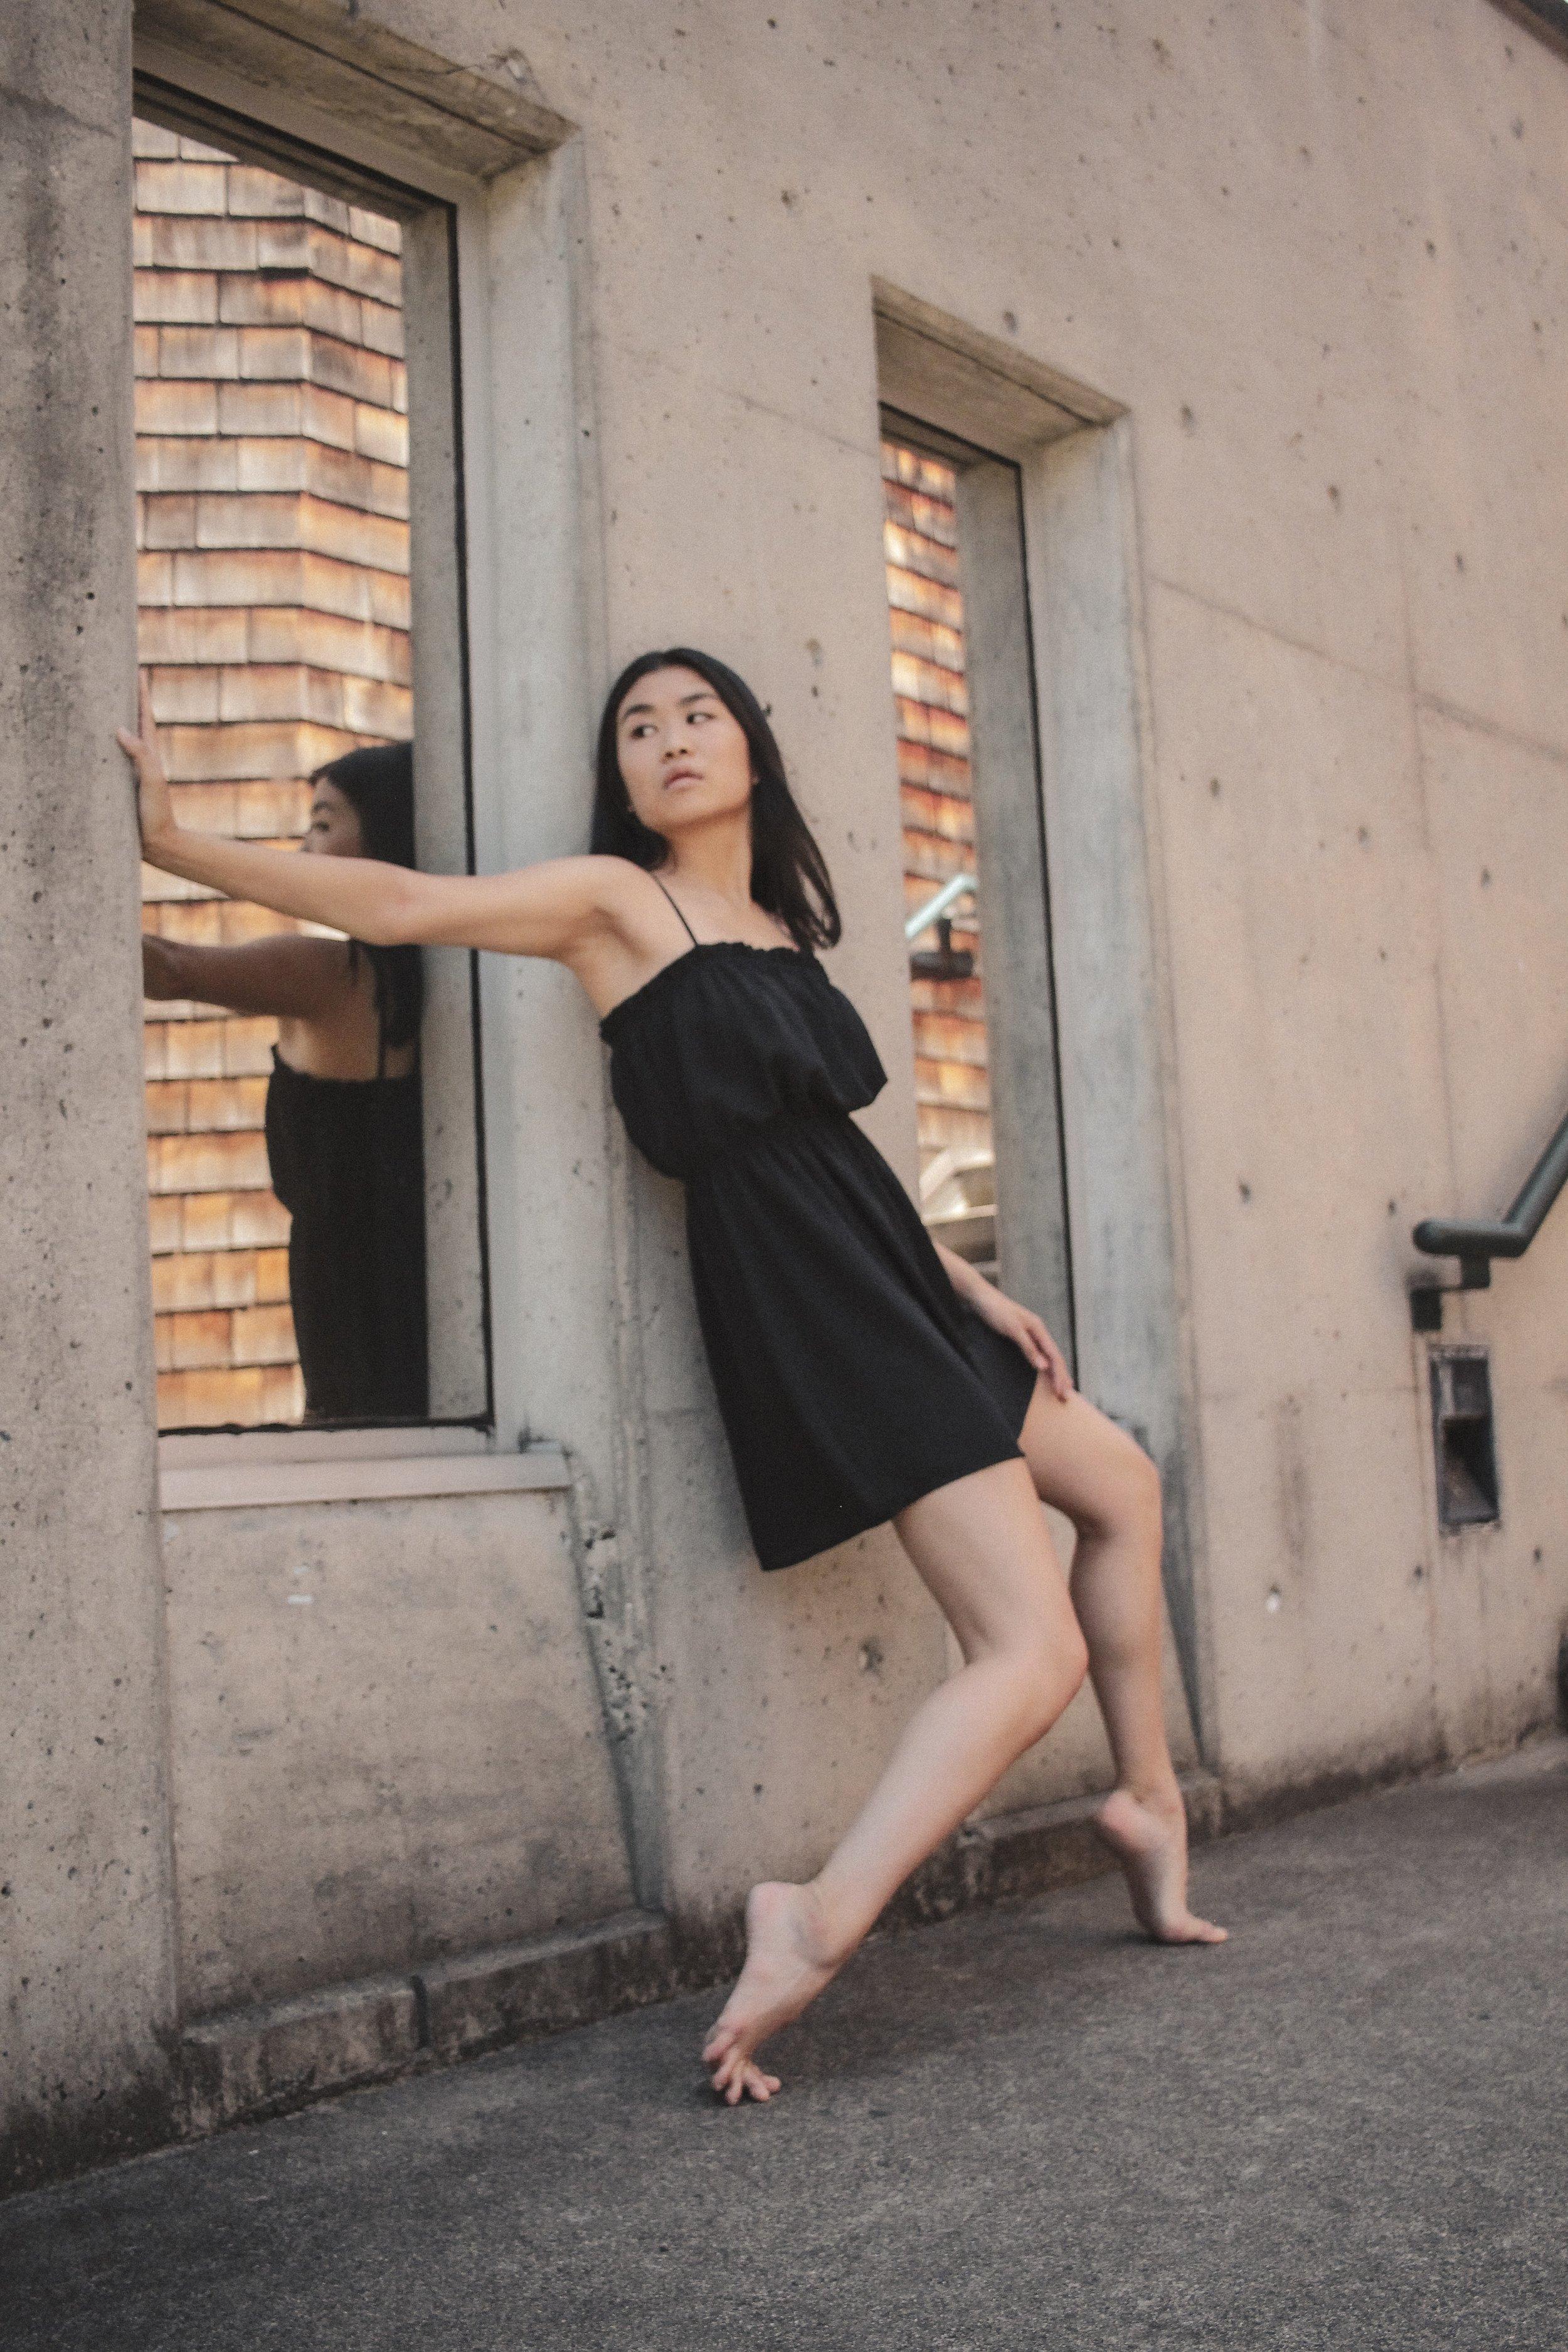 Photo by Nicole Yen